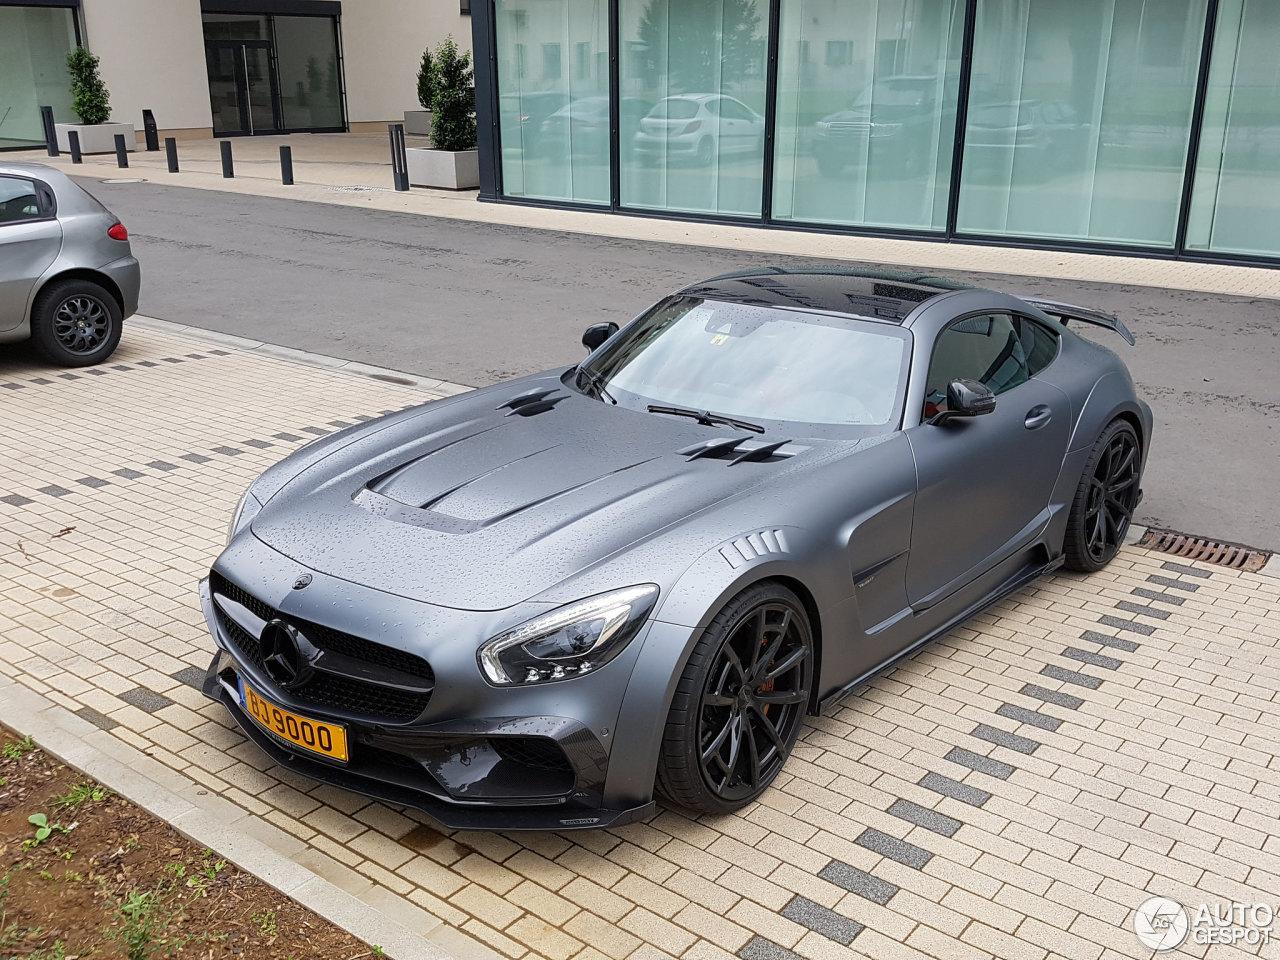 Permalink to Mercedes Benz Price Range